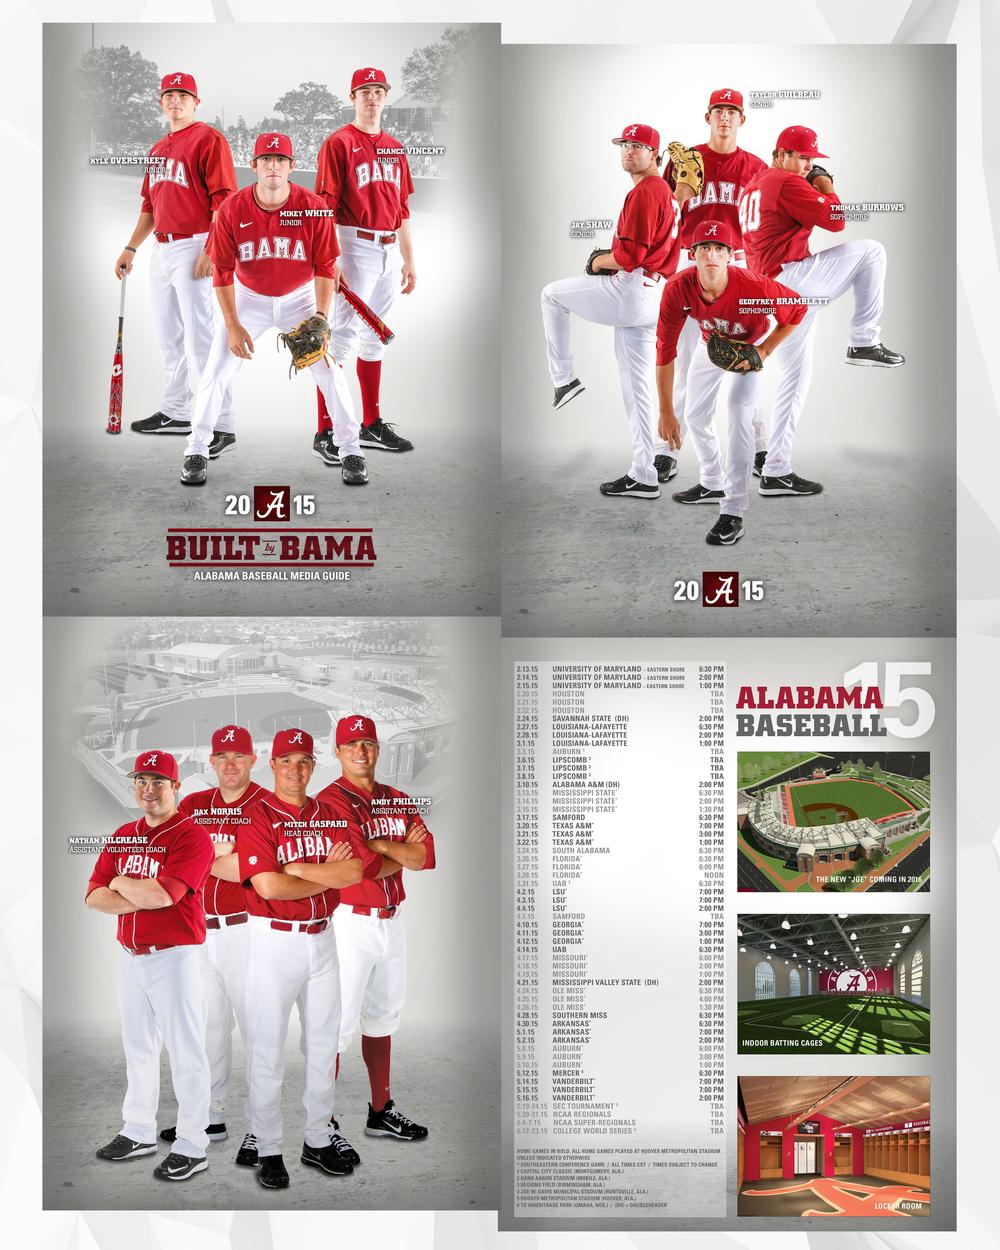 Alabama_Baseball_Media Guide.jpg